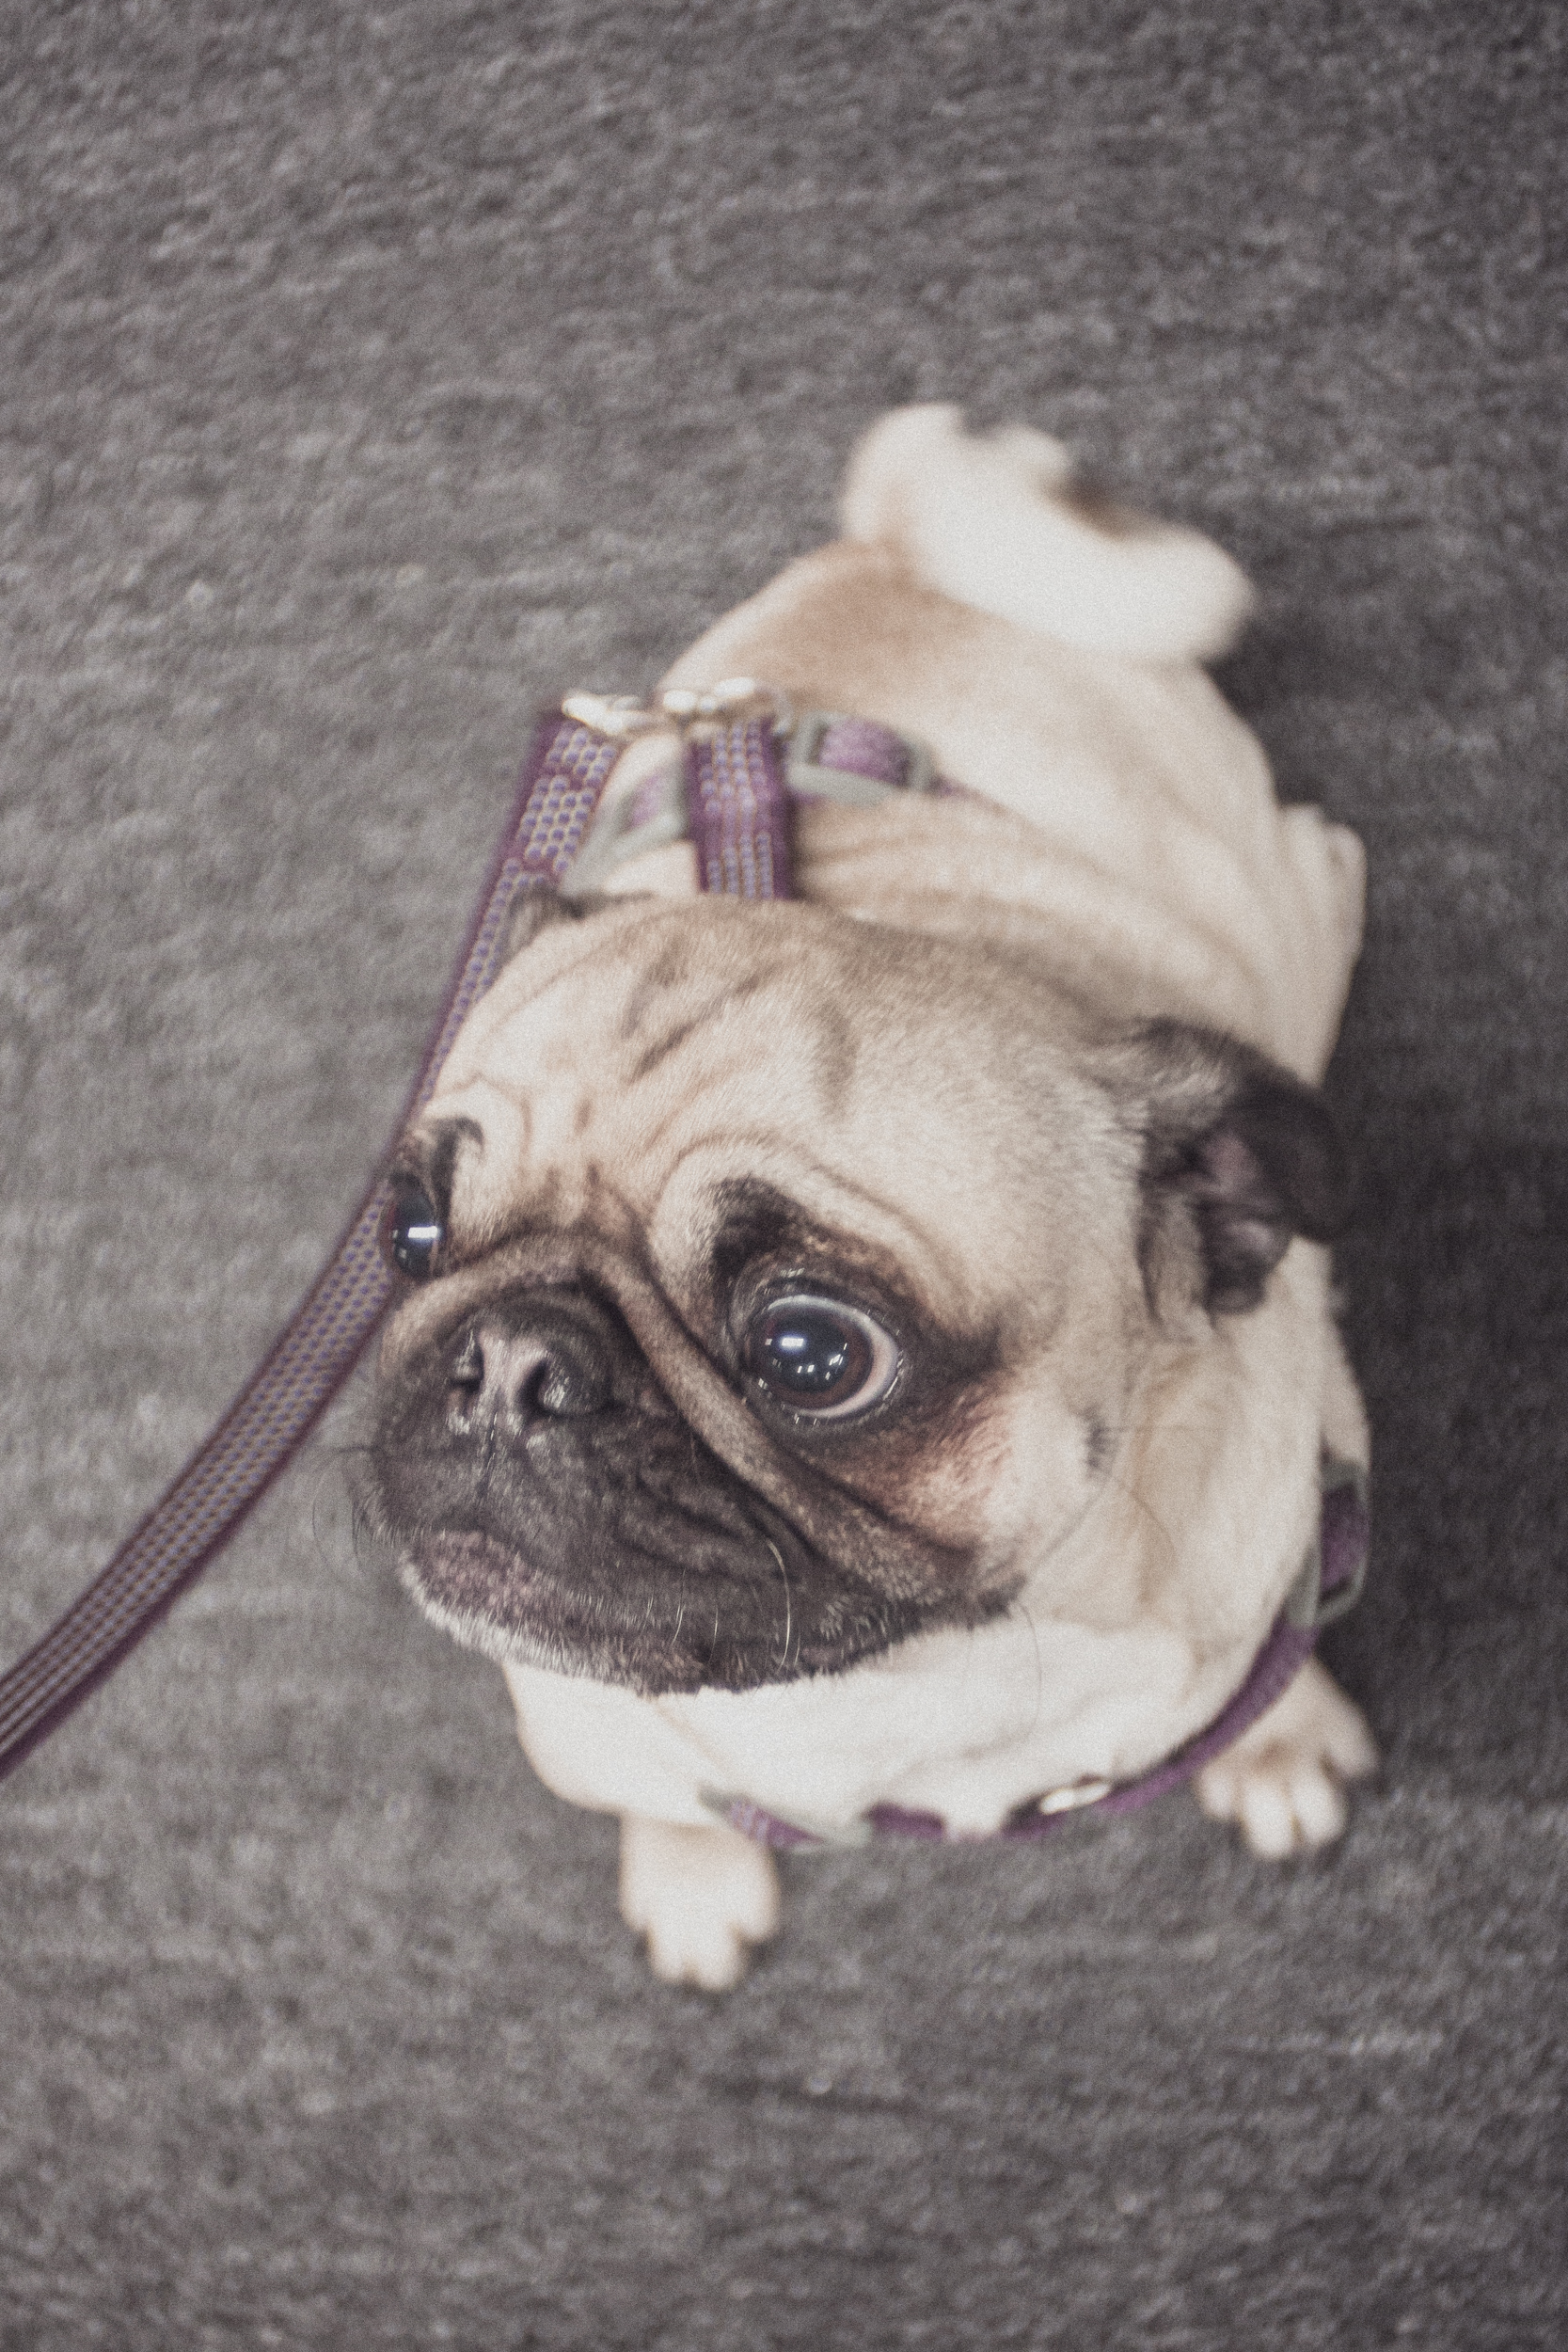 I love Rufus